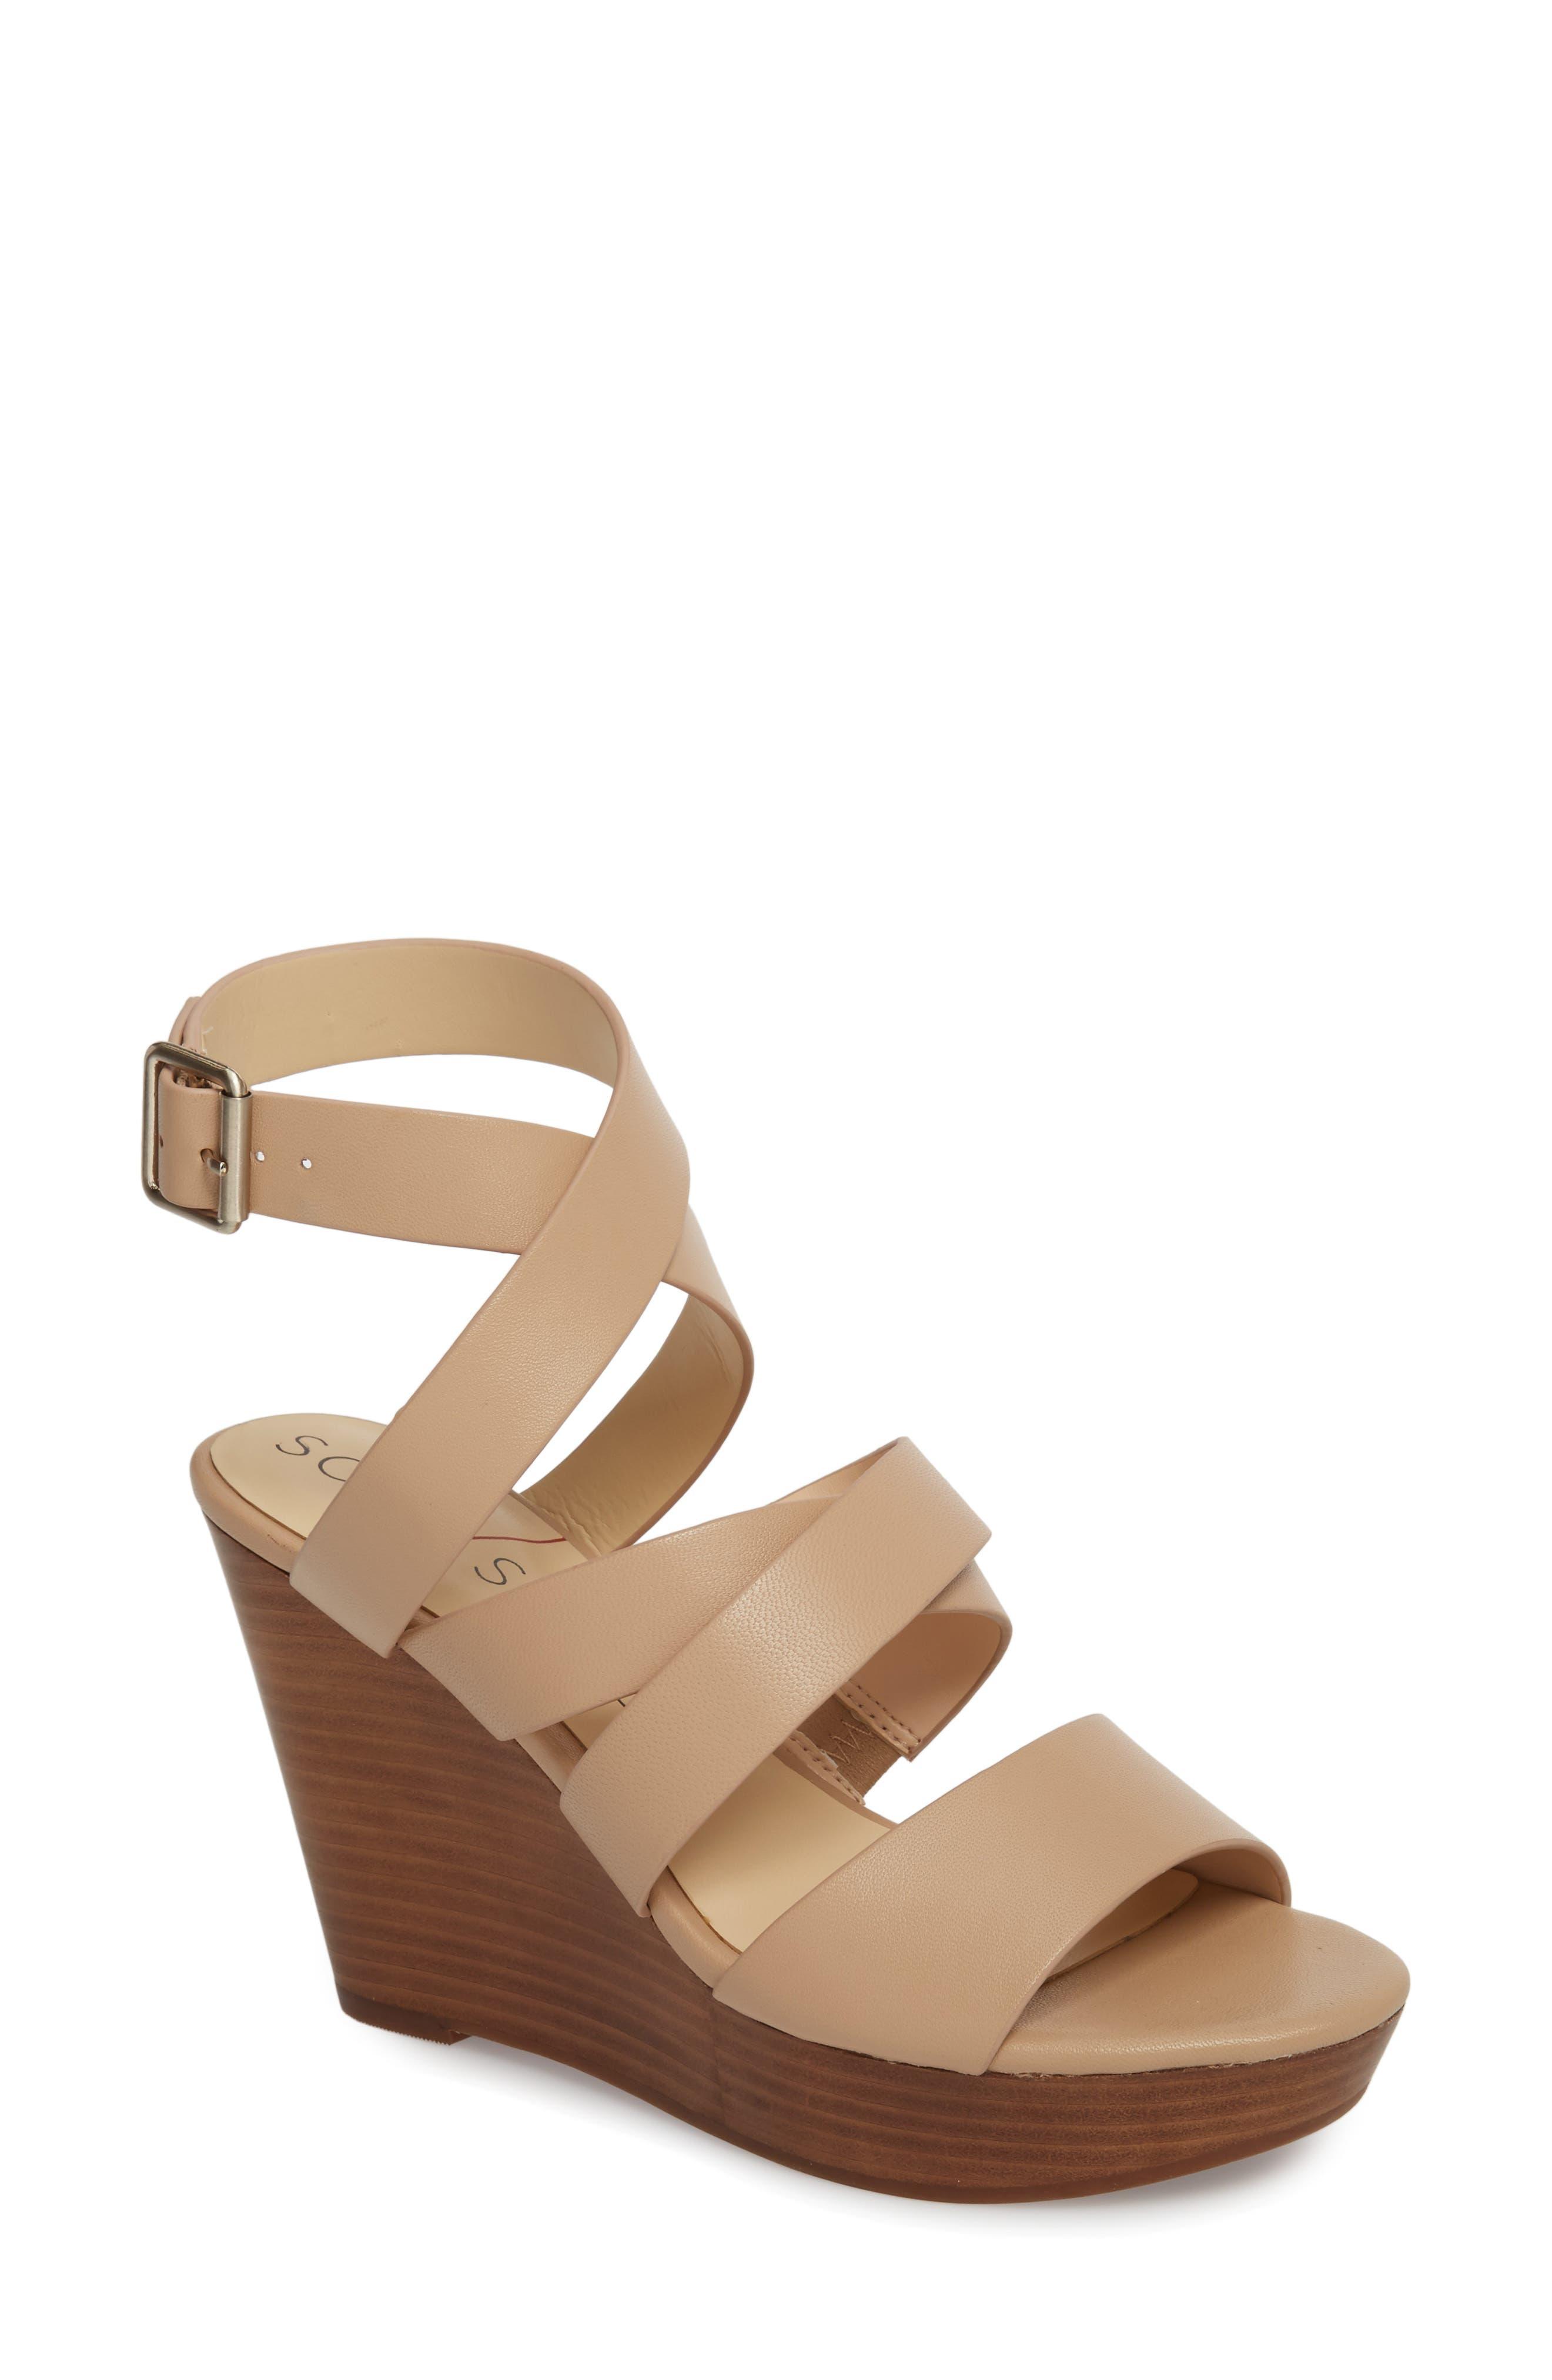 Pippy Platform Sandal,                         Main,                         color, Tan